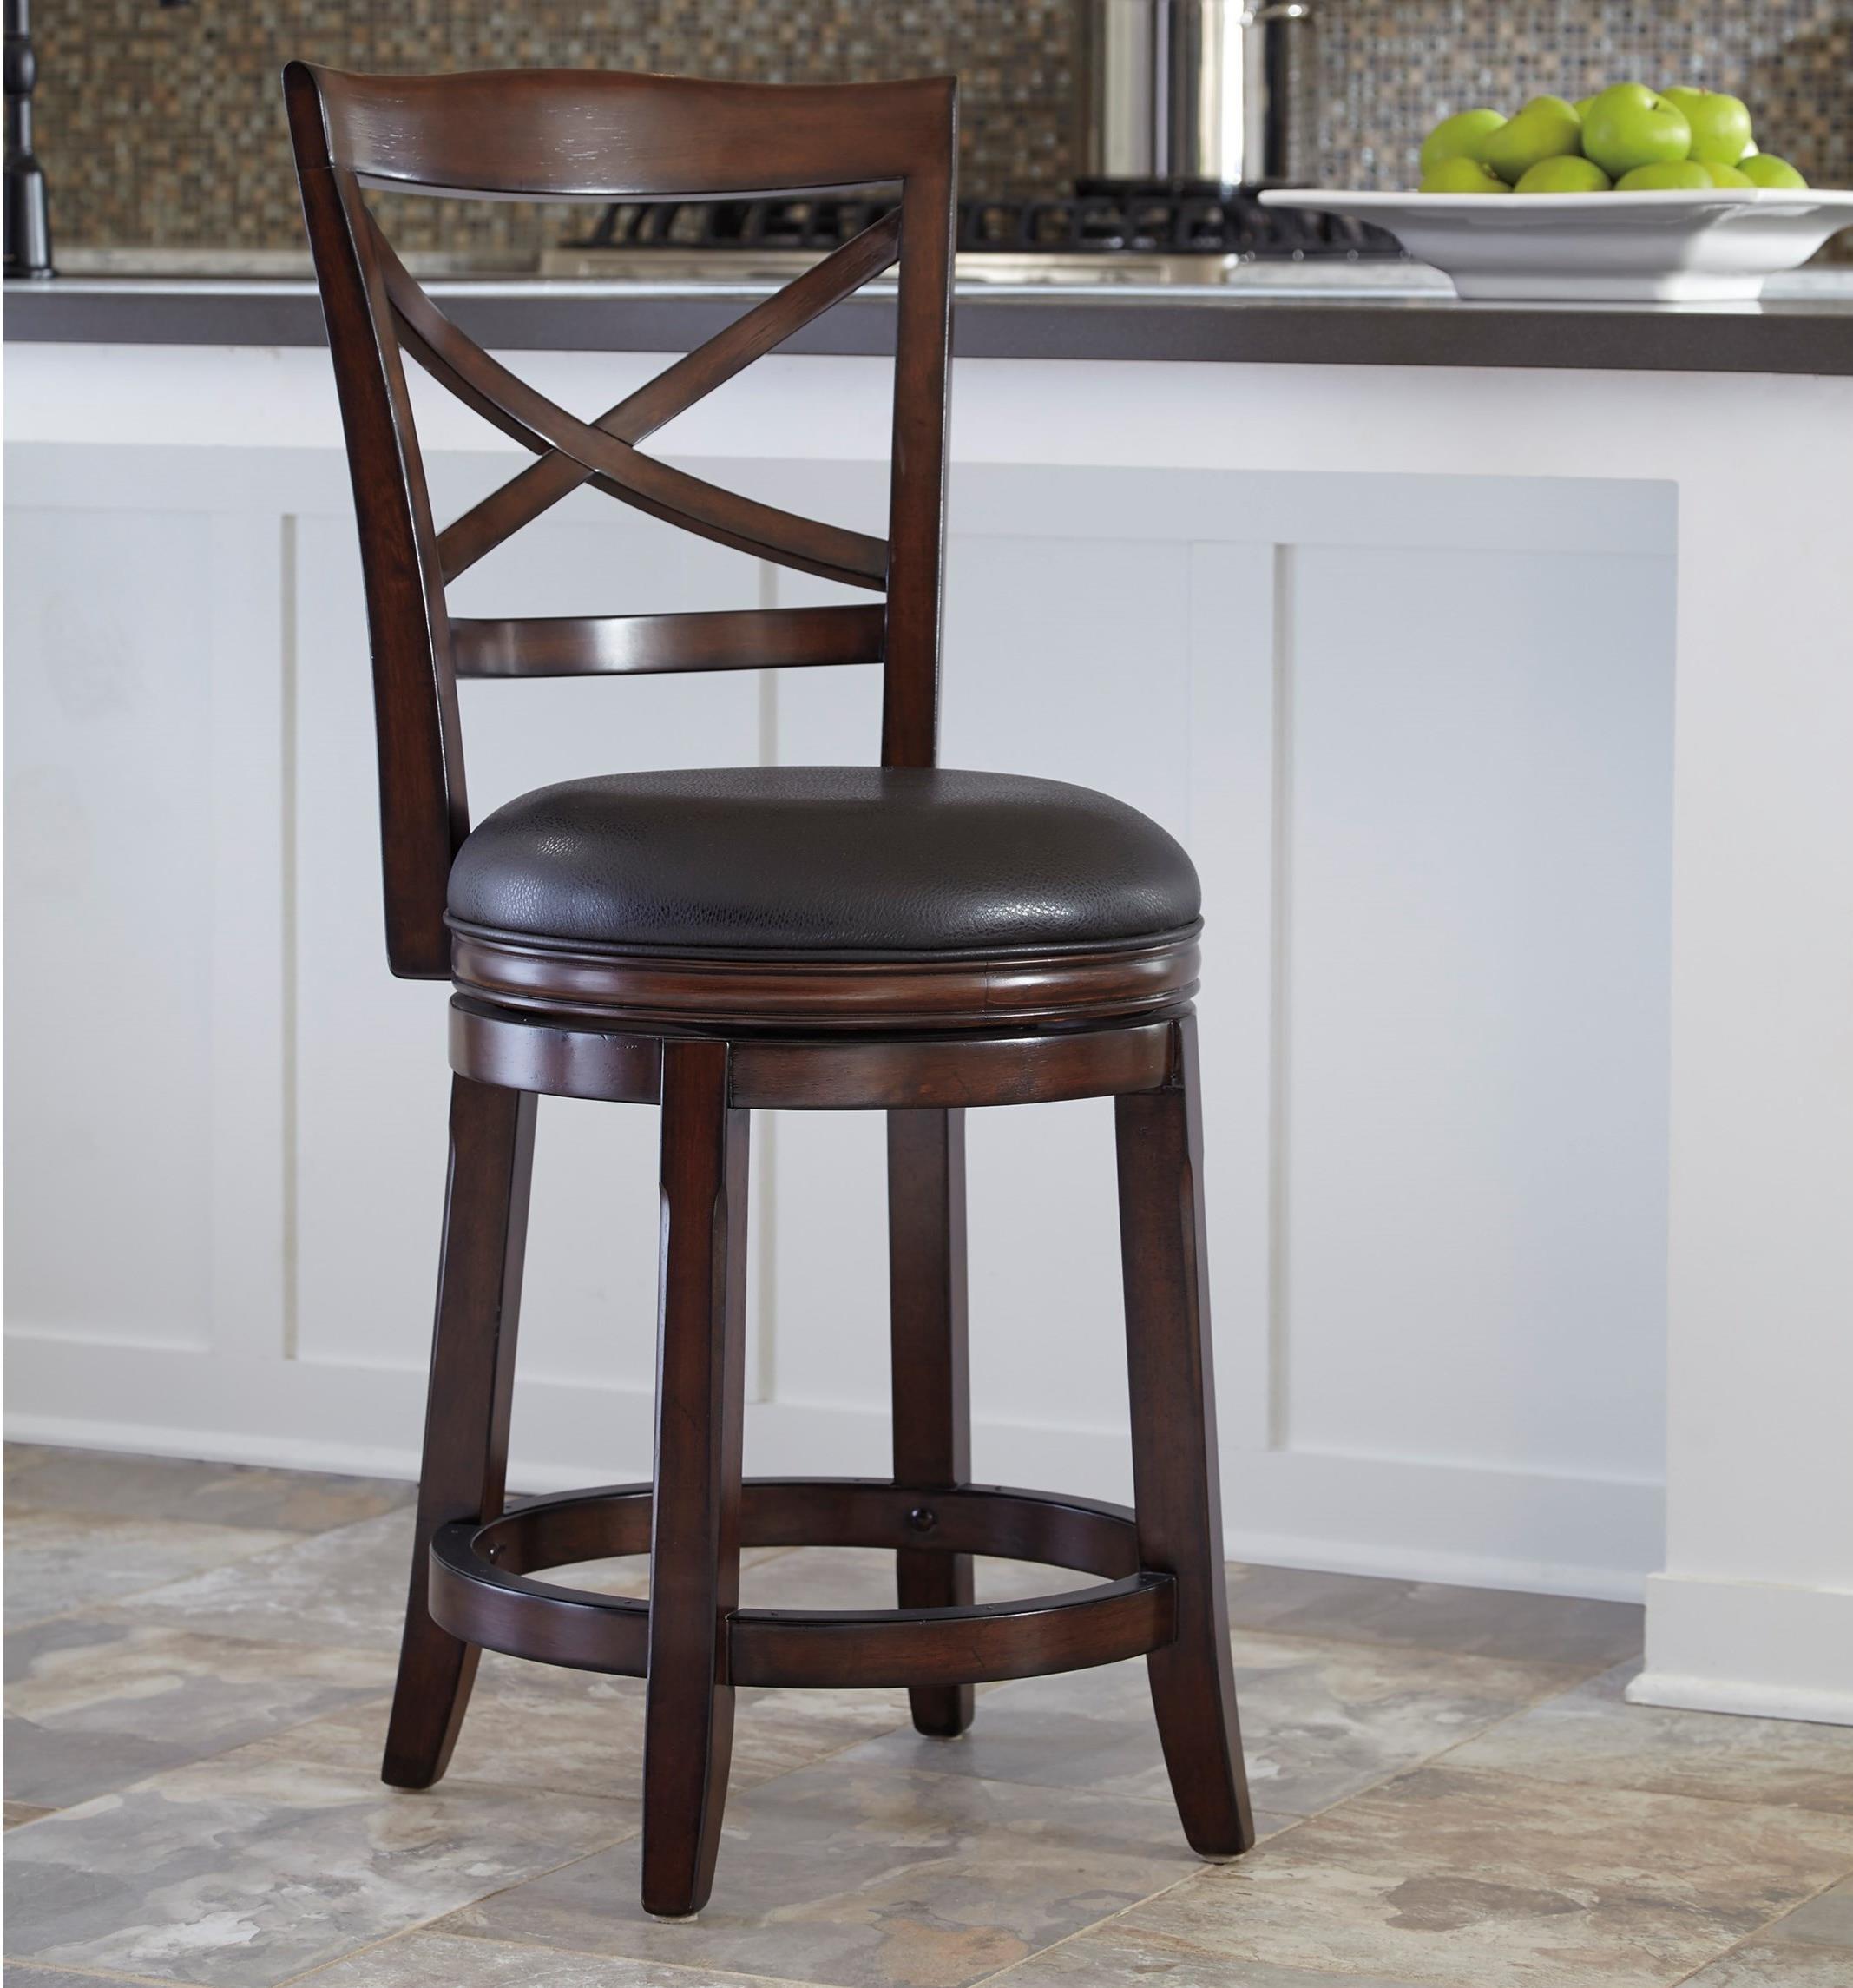 Ashley Furniture Porter Counter Height X Back Upholstered